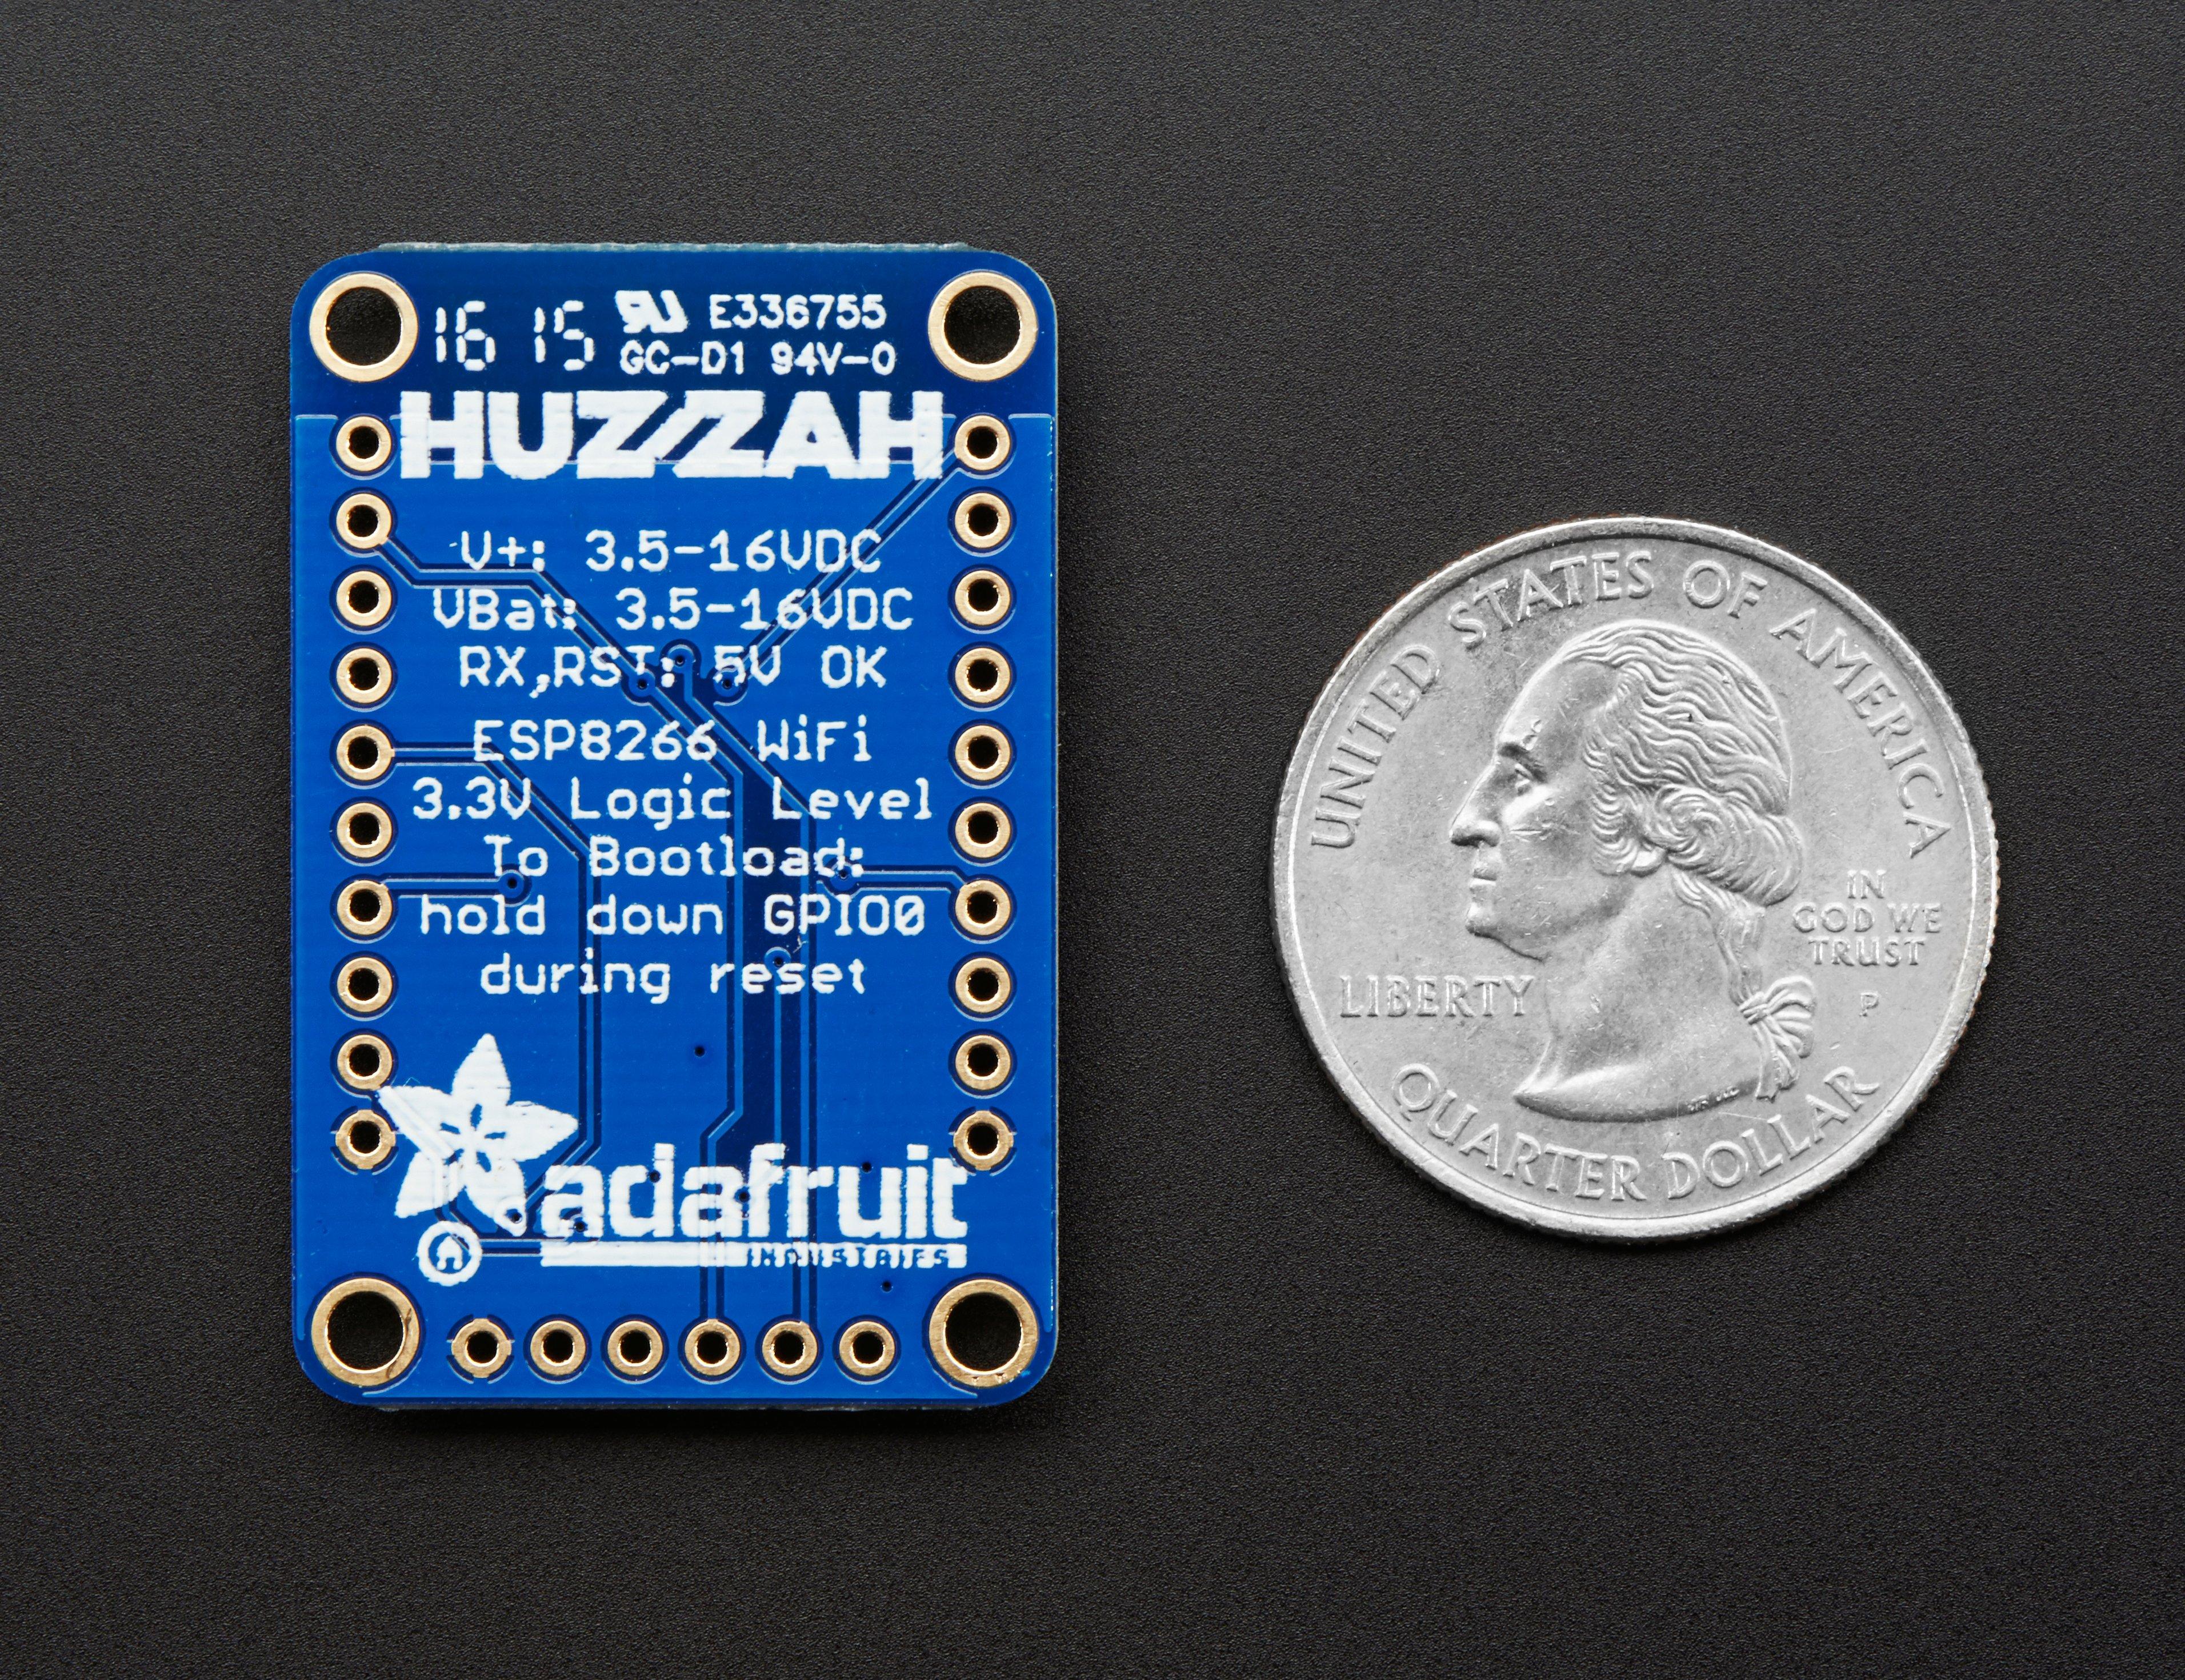 Using HUZZAH ESP8266 and Arduino Uno